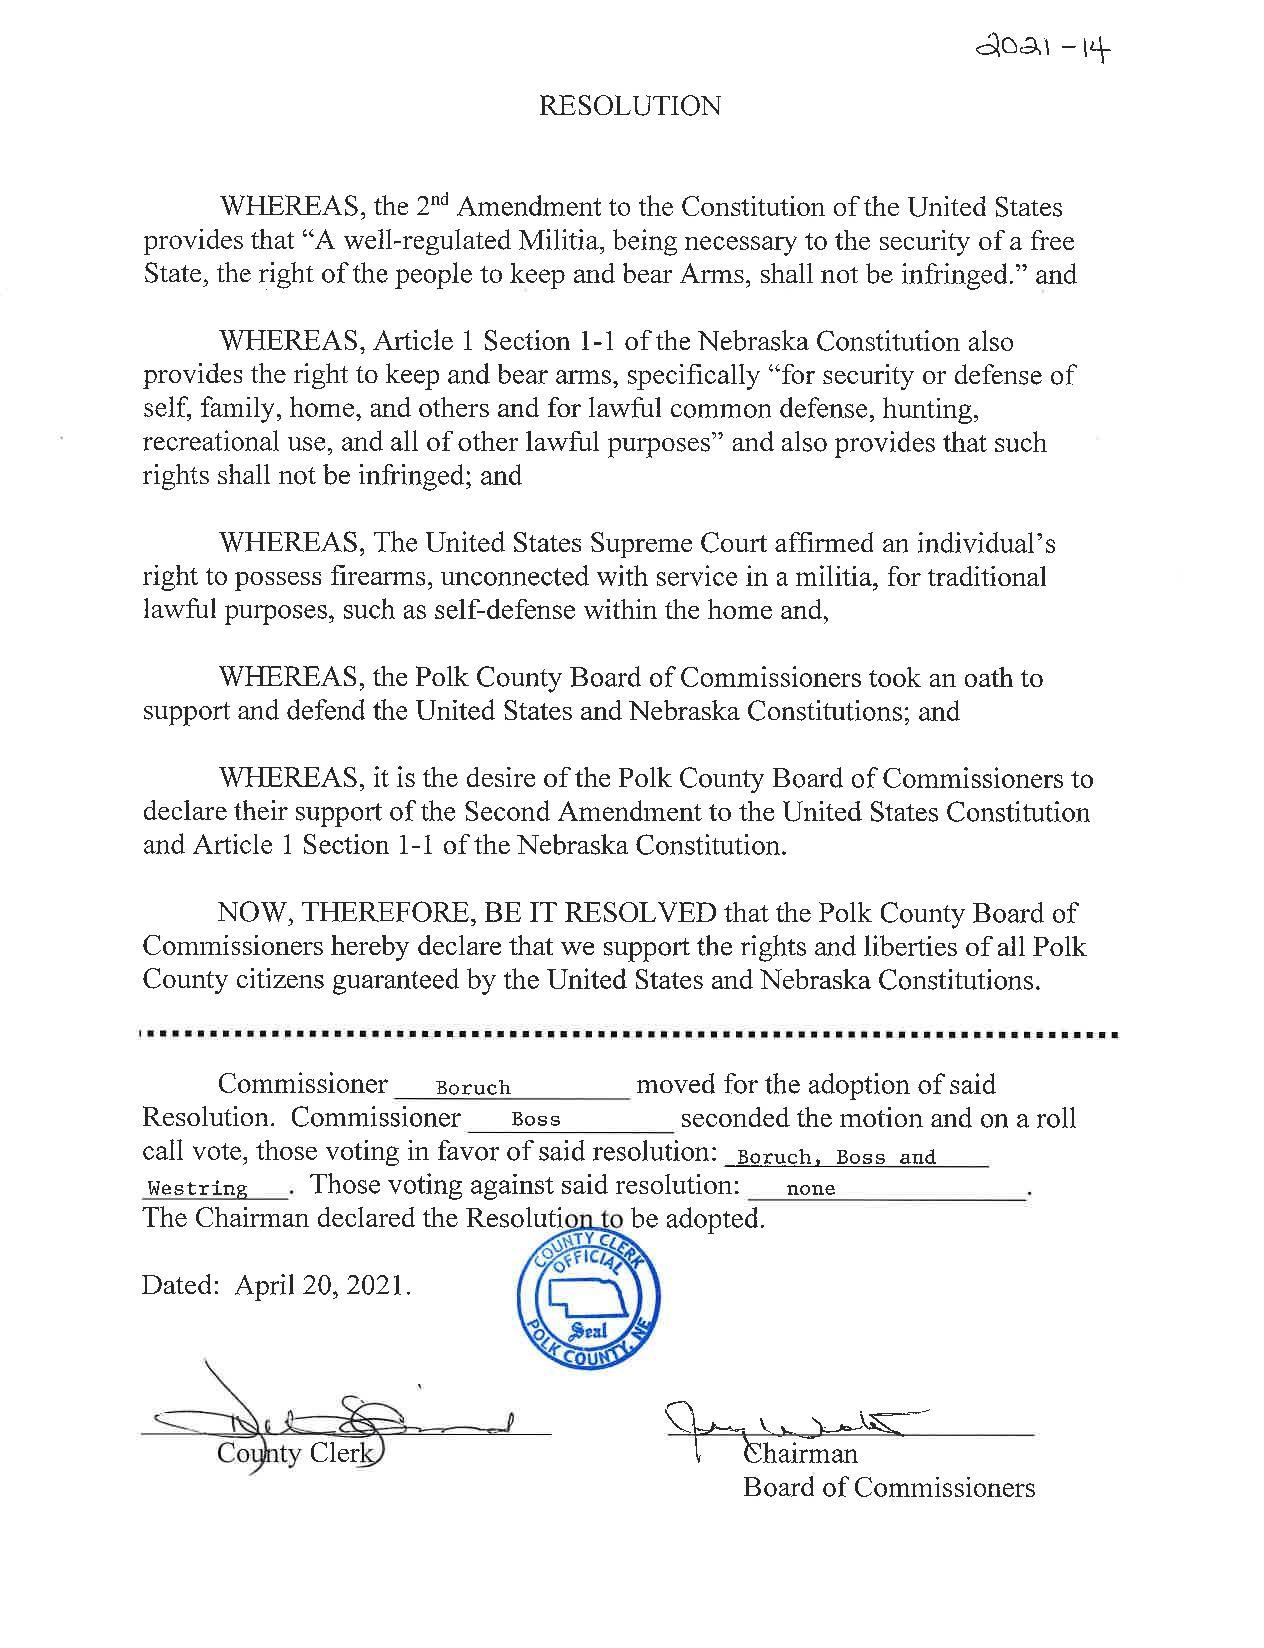 Polk County Nebraska 2A Resolution